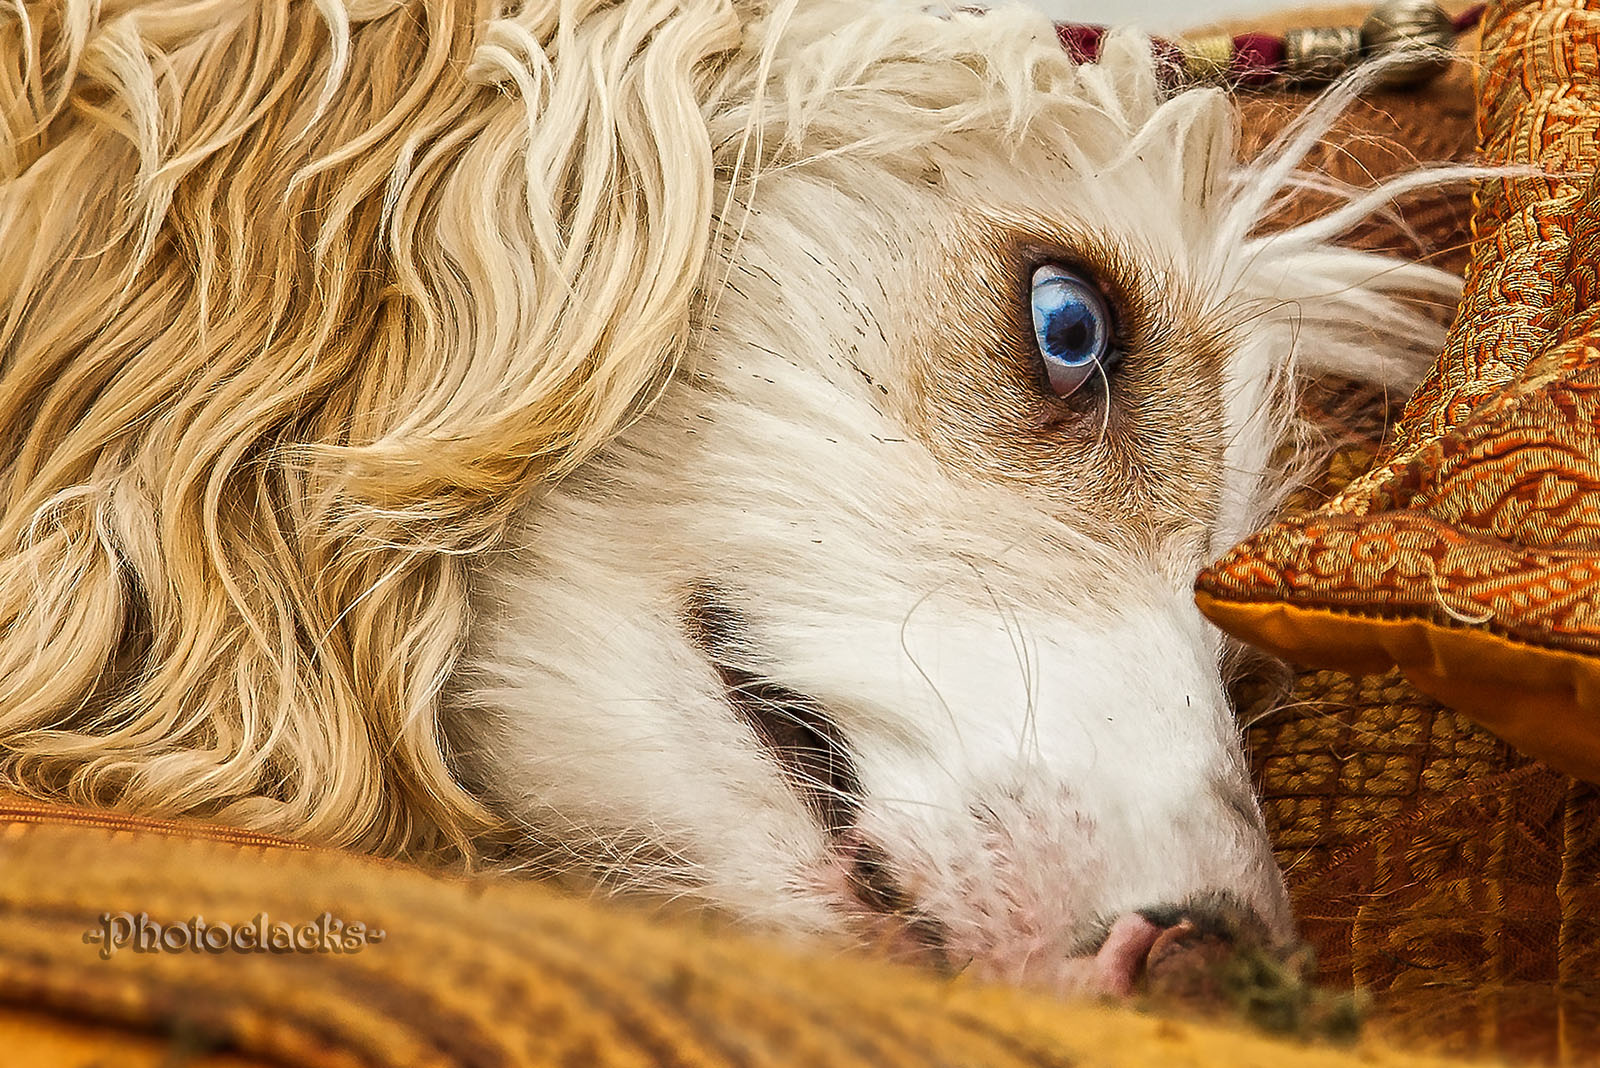 Zack - Auge blau - Wauwau